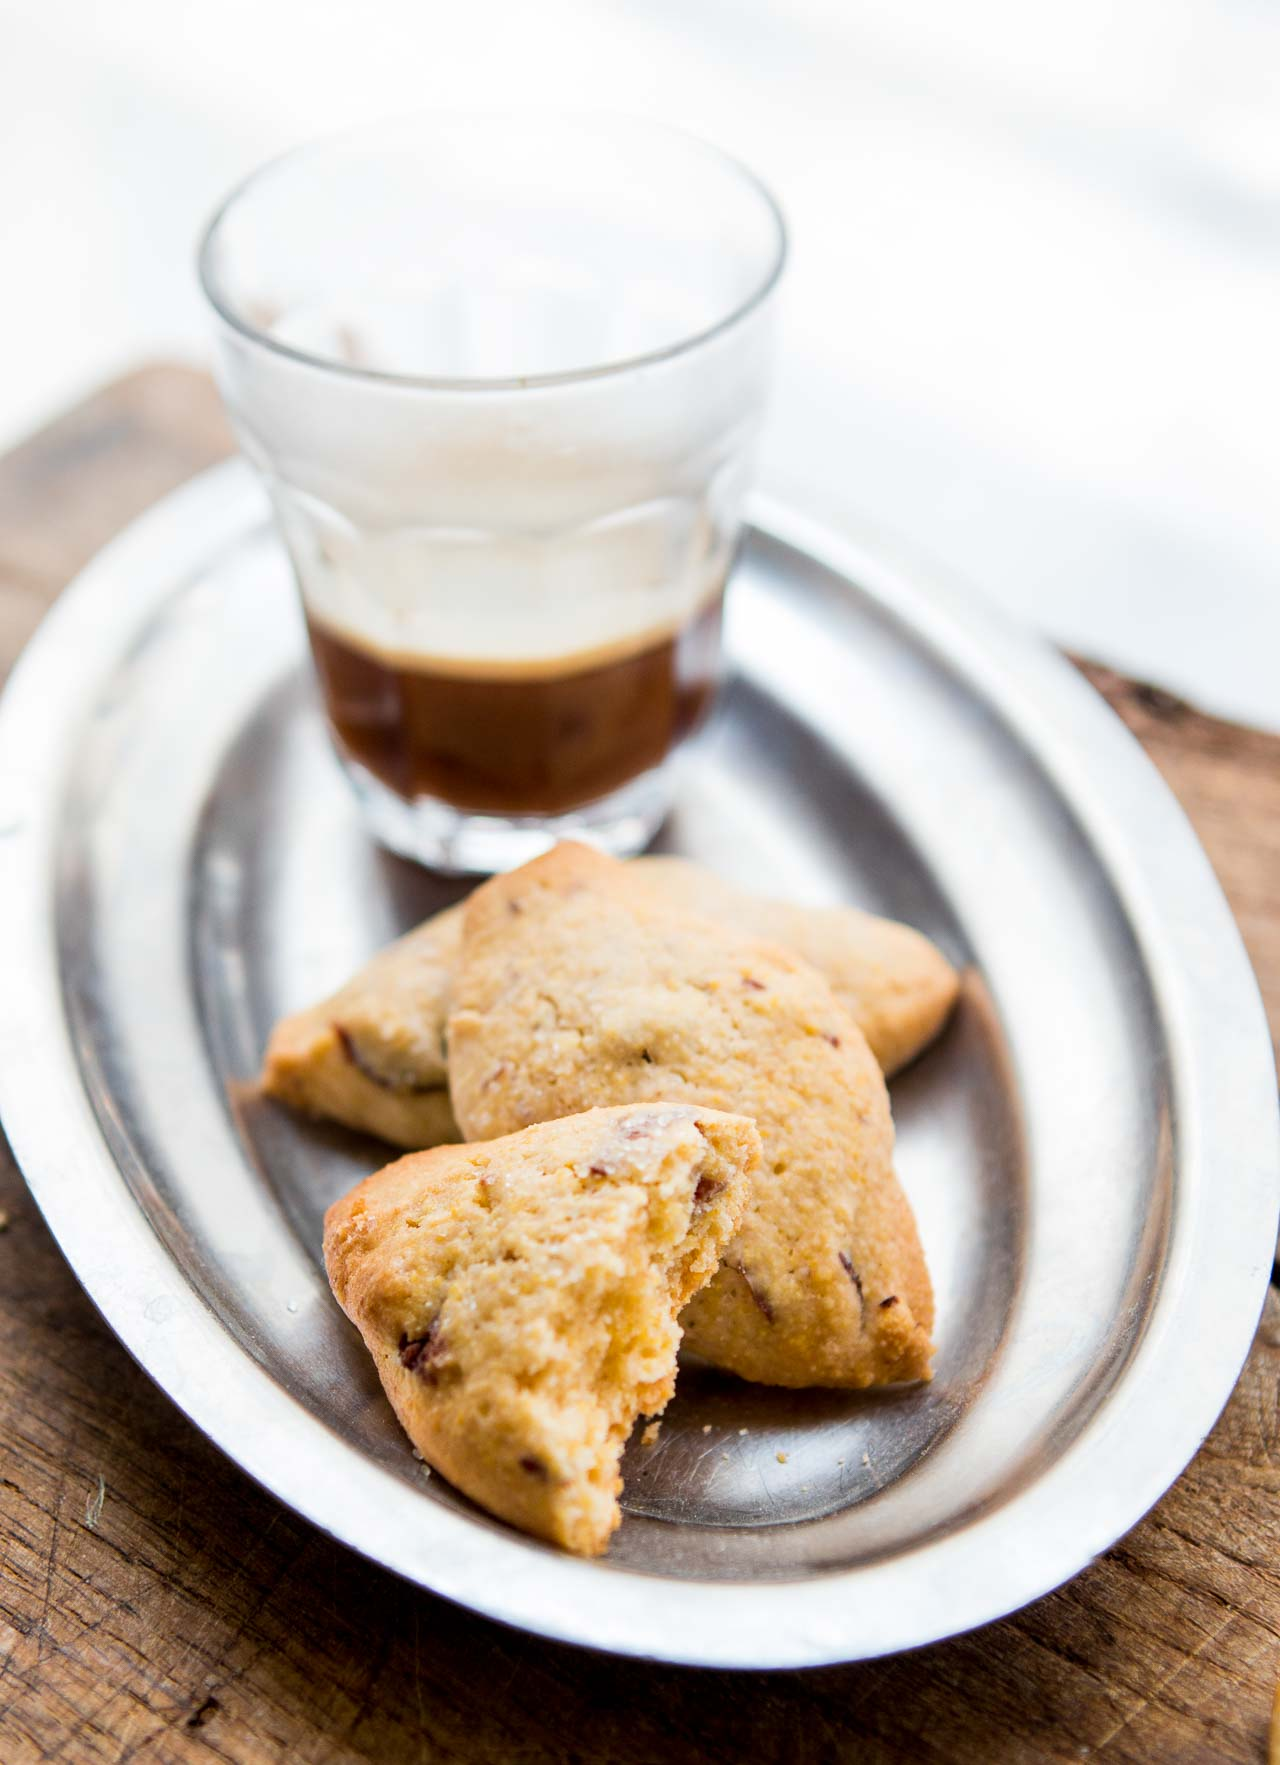 Crispy, crunchy Italian polenta cookies